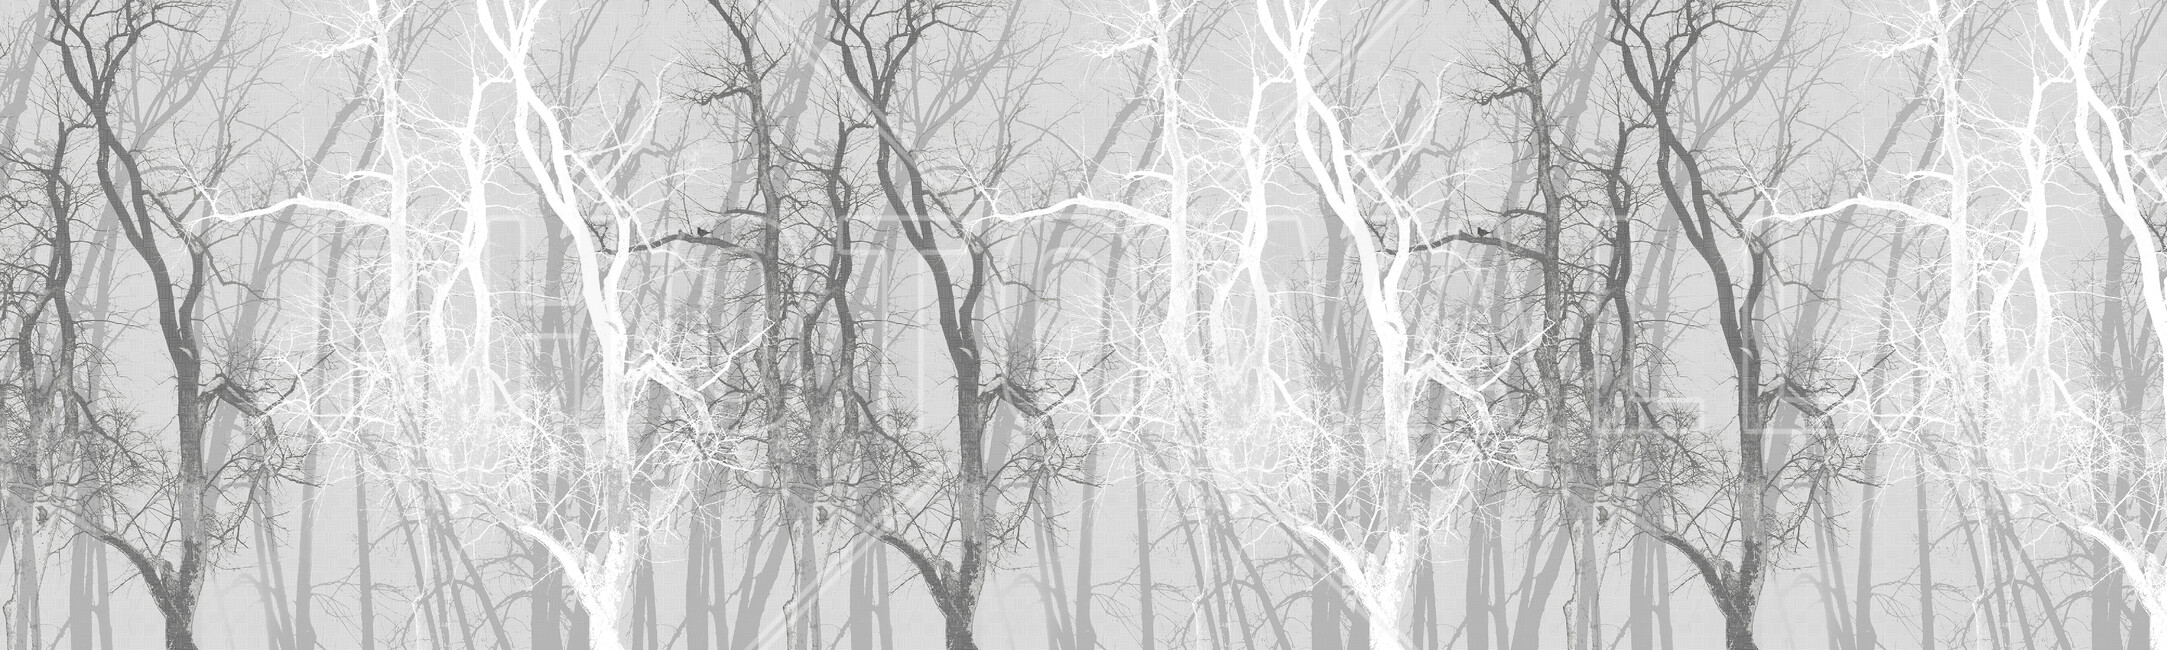 Patterns, fonds, des trucs jolis quoi Wander-trees-charcoal-1